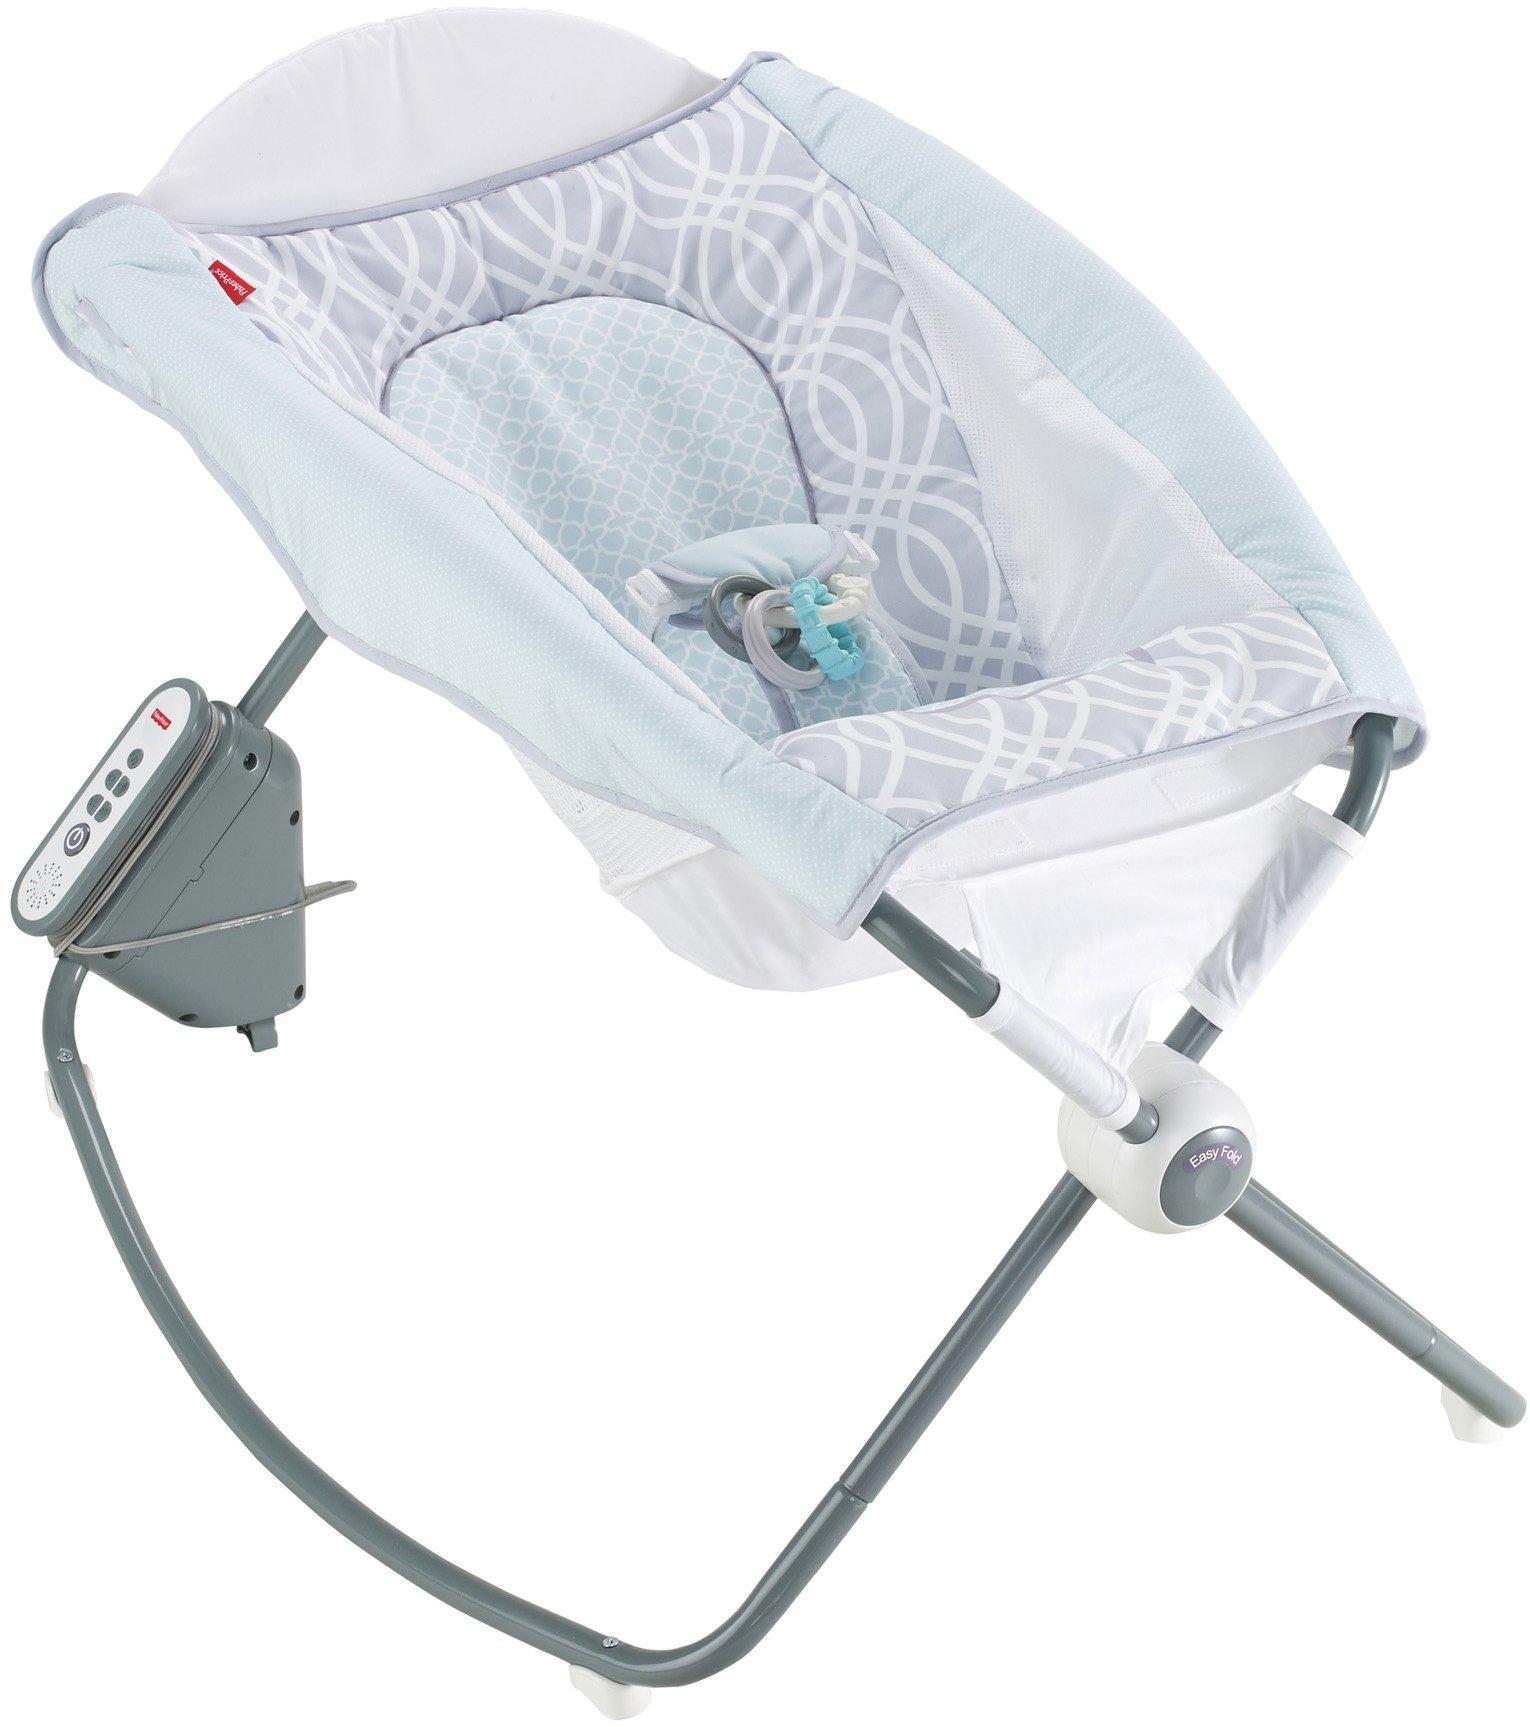 Fisher-Price Newborn Auto Rock 'n Play Sleeper, Blue/Grey